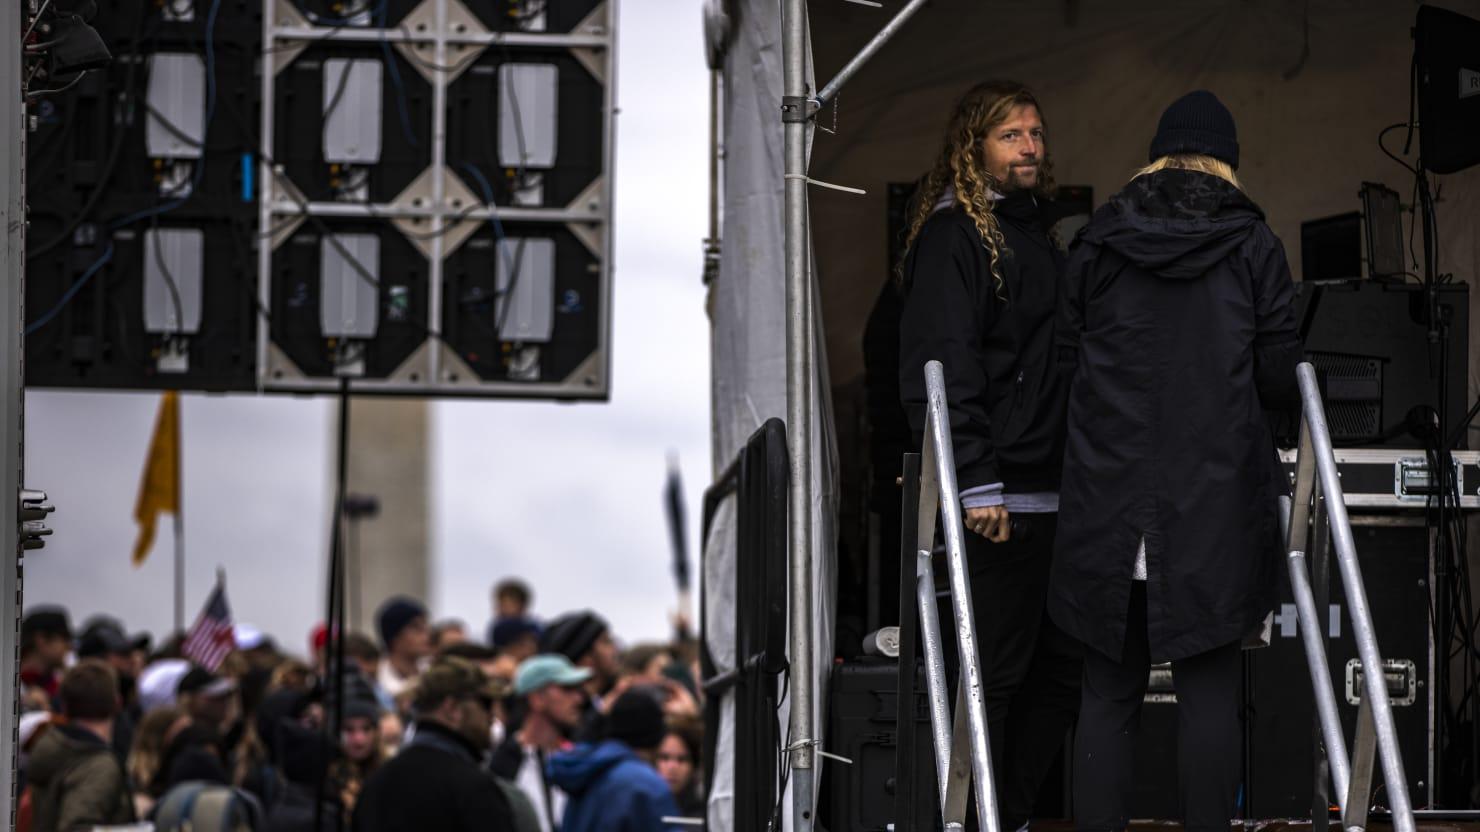 Church Leader Sean Feucht Visits White House During 'Superspreader' Tour